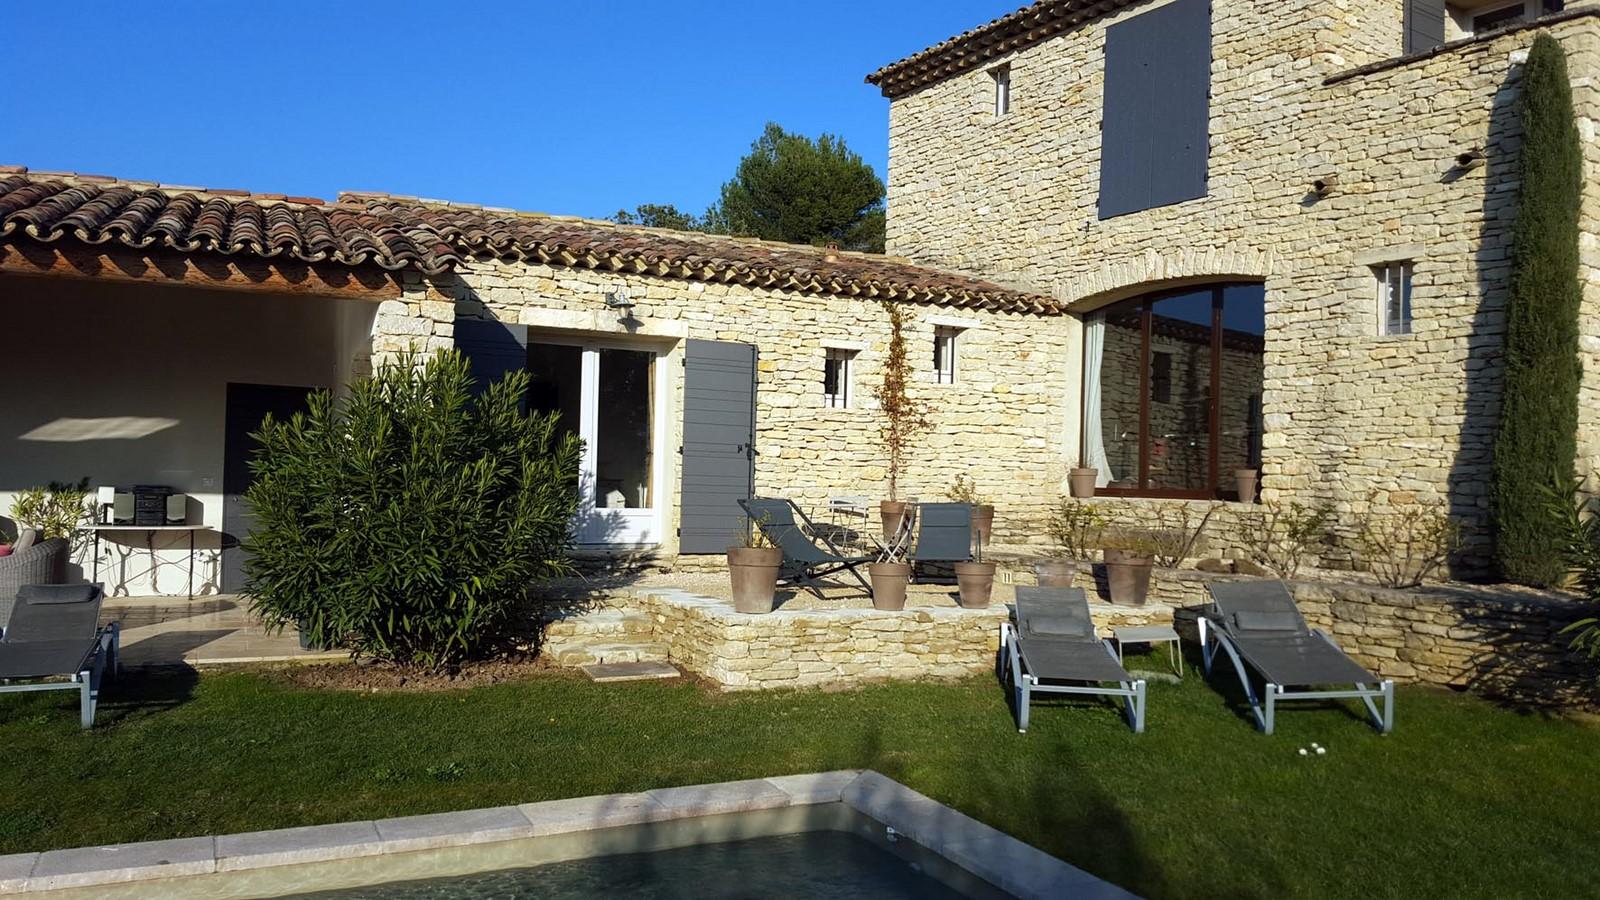 Terrasses chambre jade 8 hiver terrasses de gordes luberon for Chambre d hote baux de provence